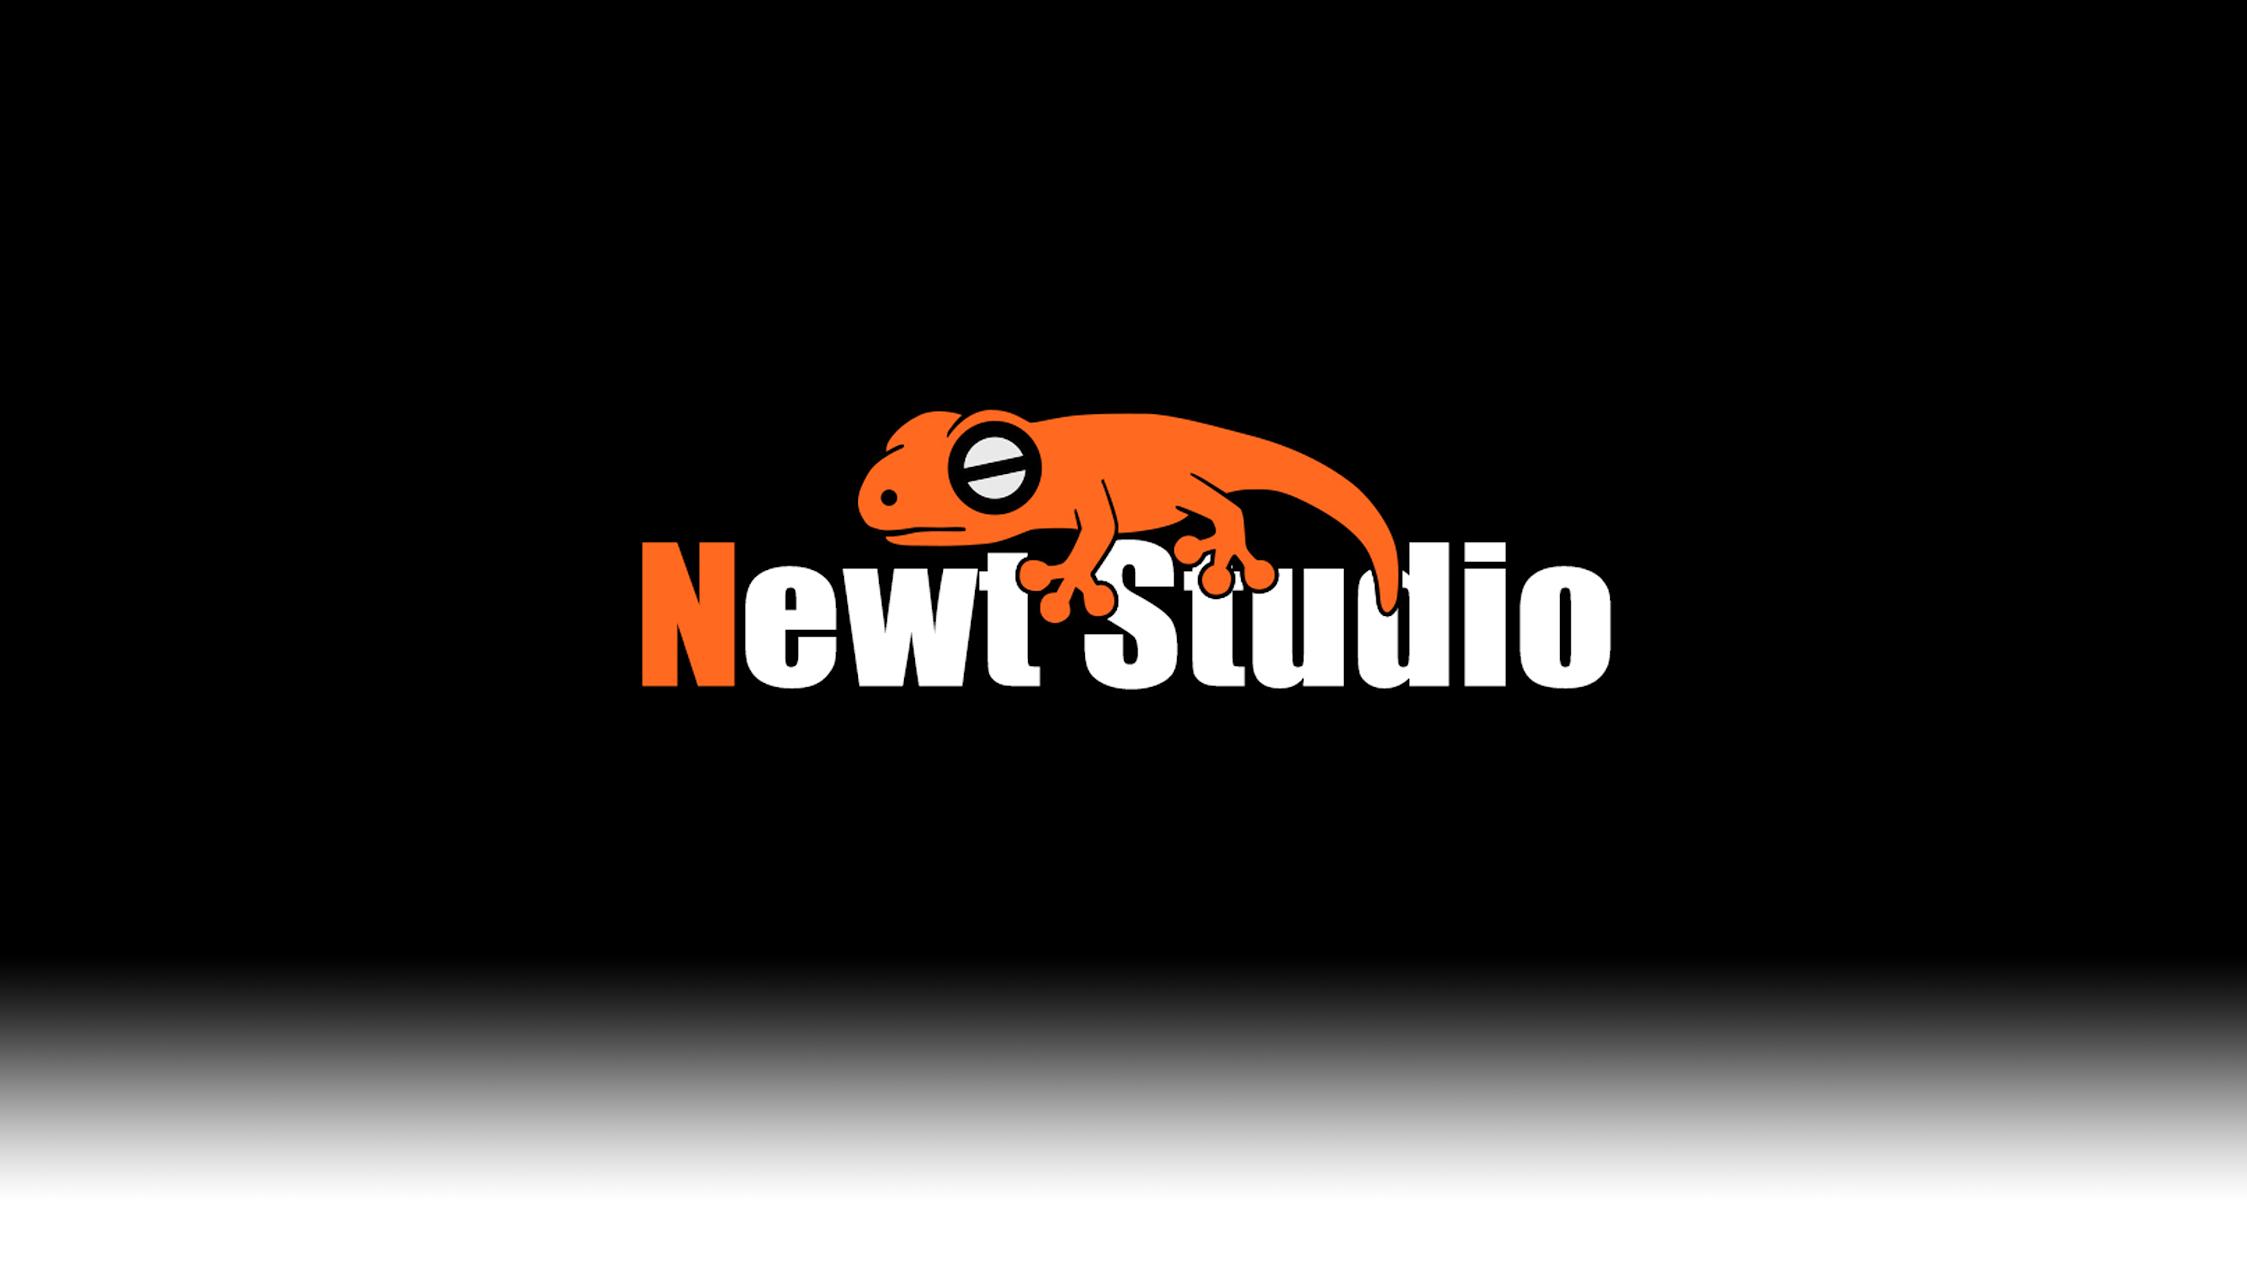 NEWT STUDIO